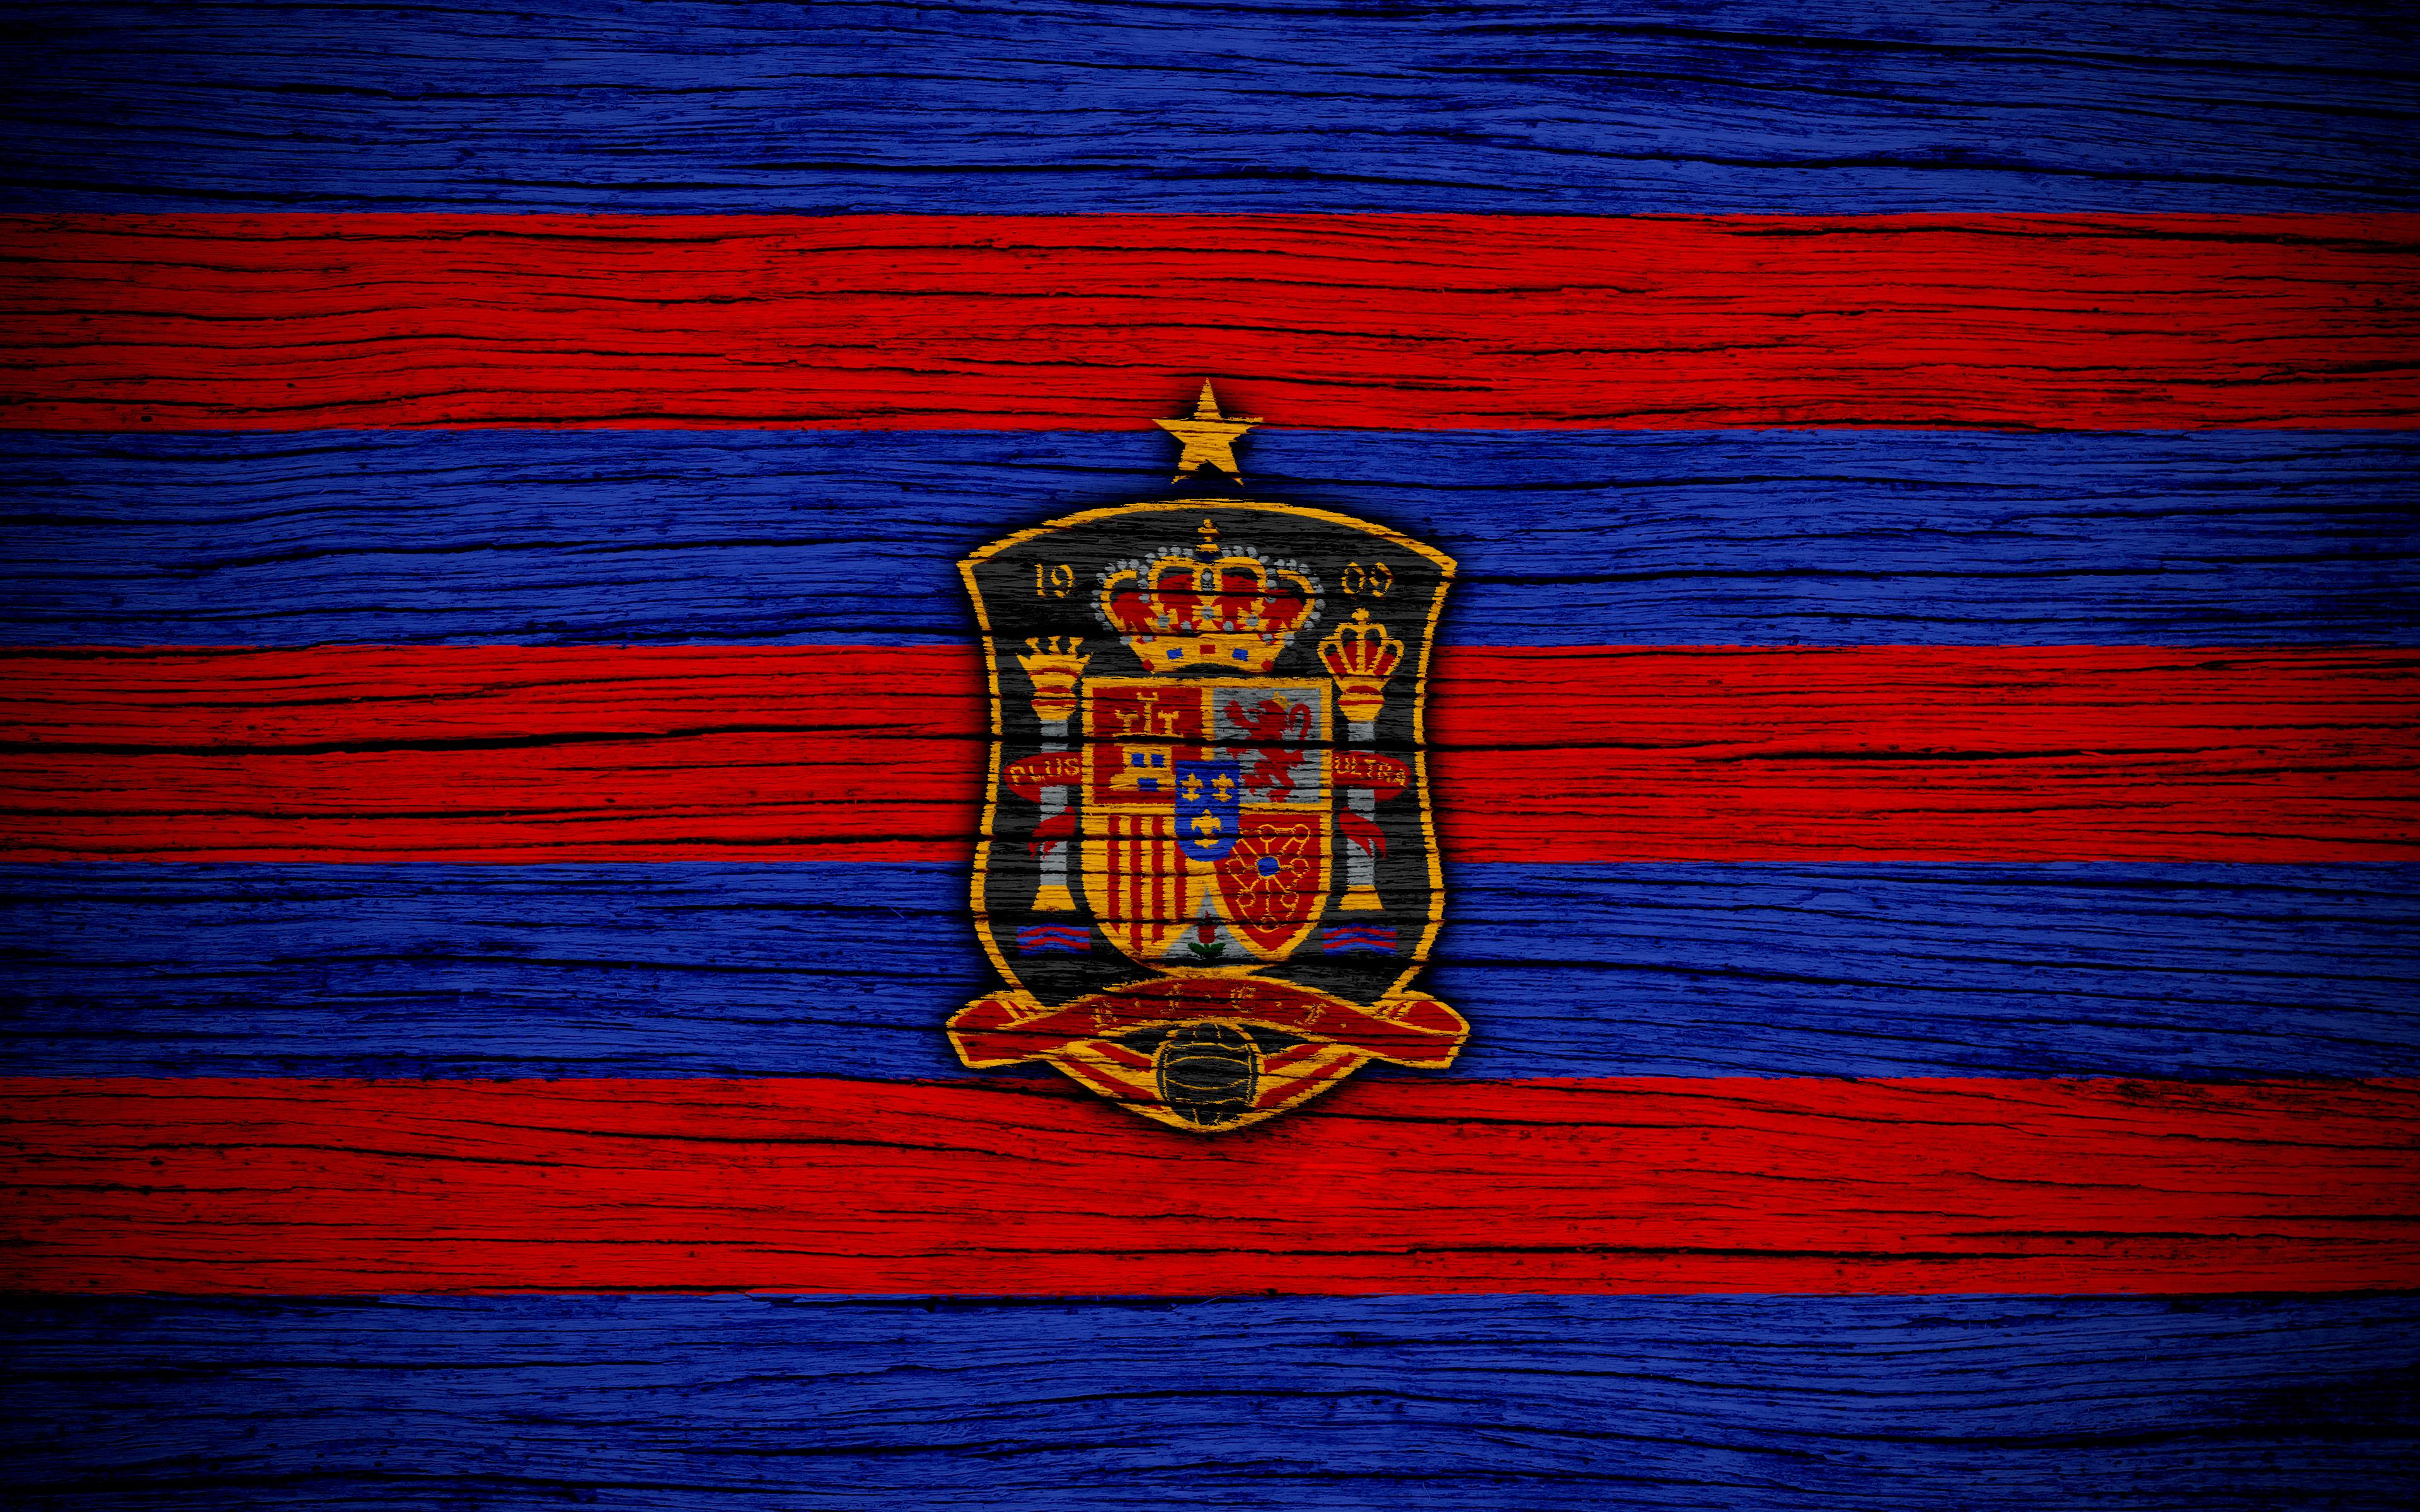 Spain National Football Team 4k Ultra HD Wallpaper